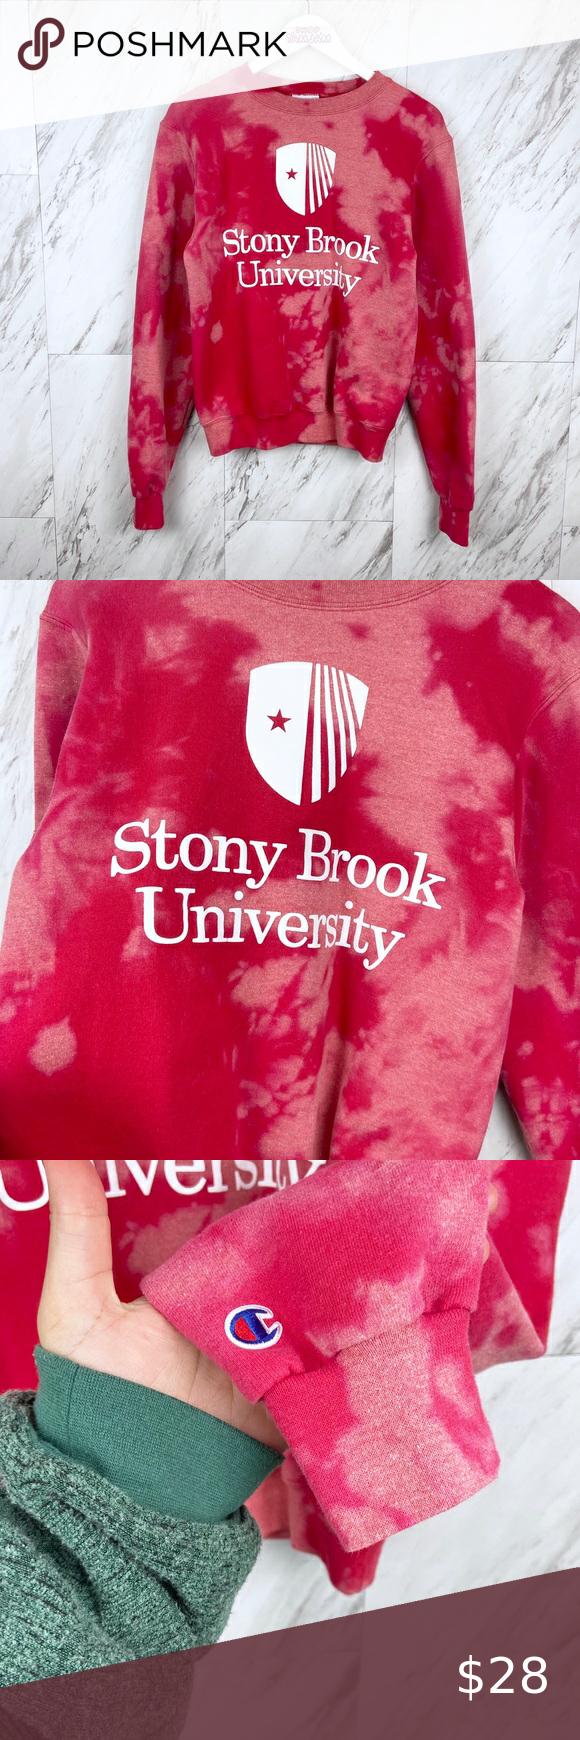 Champion Stony Brook University Sweatshirt Sweatshirts University Sweatshirts Crew Neck Sweatshirt [ 1740 x 580 Pixel ]